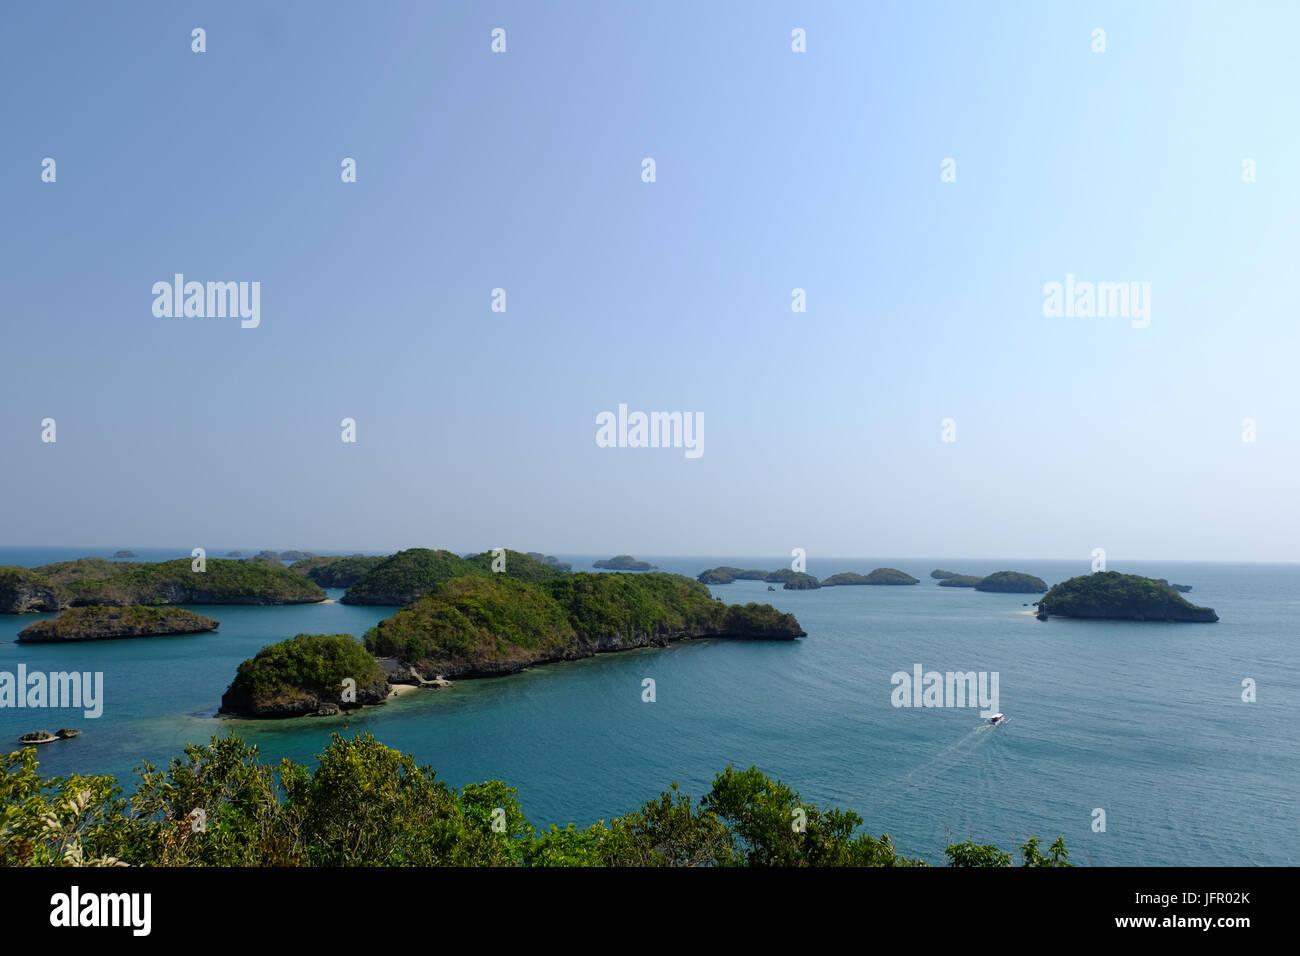 Hundred island in Pangasinan - Stock Image